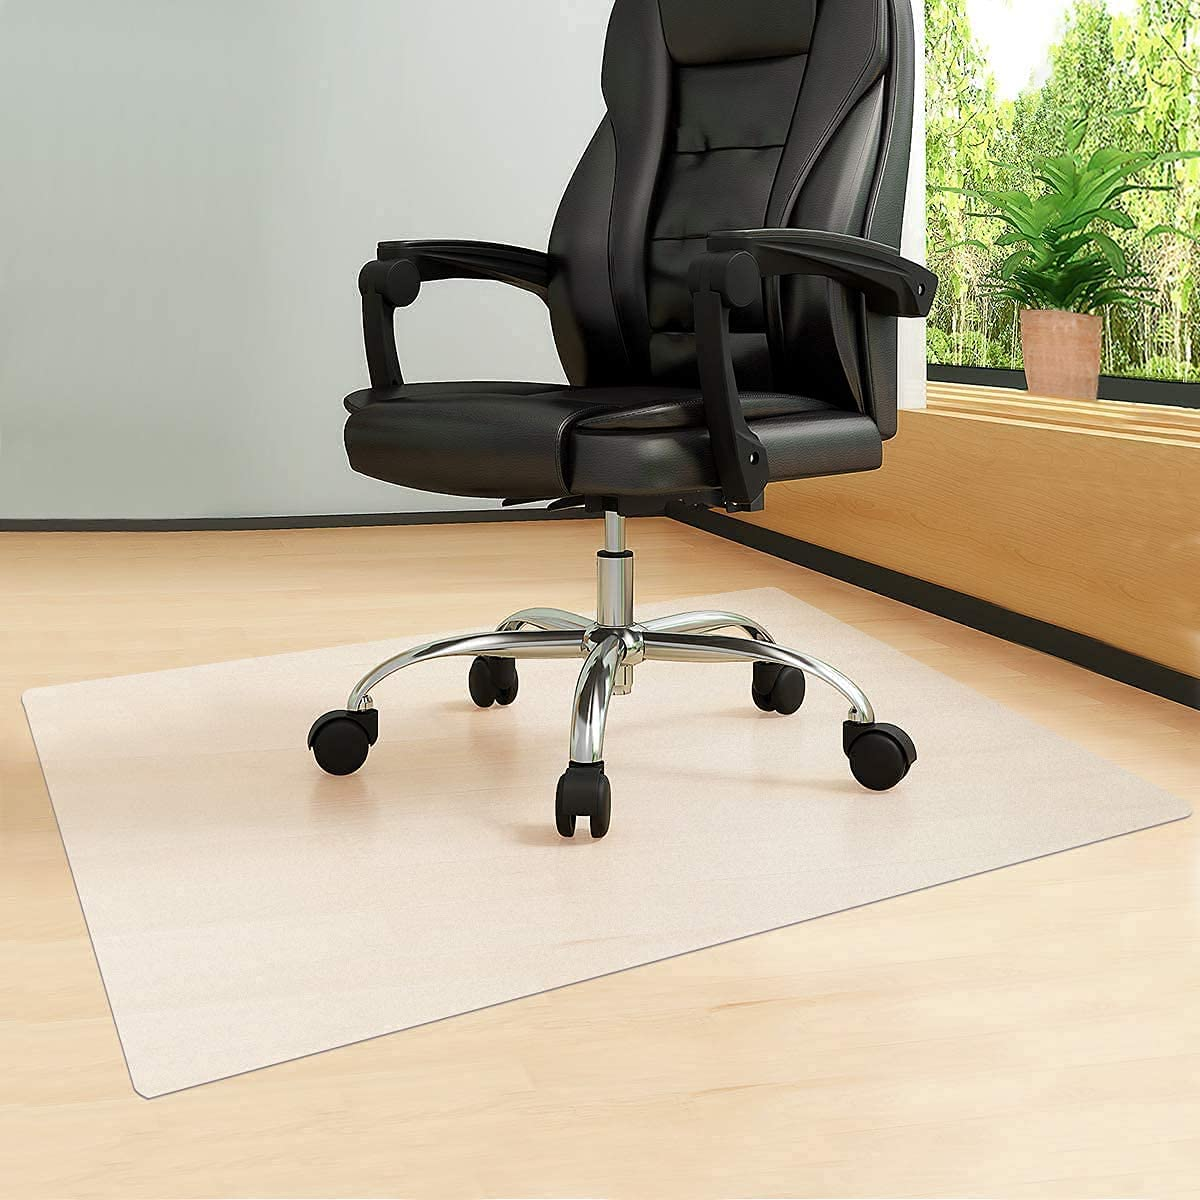 Crystal Chair Mat for Floor Hardwood Nashville-Davidson Mall Animer and price revision Mats